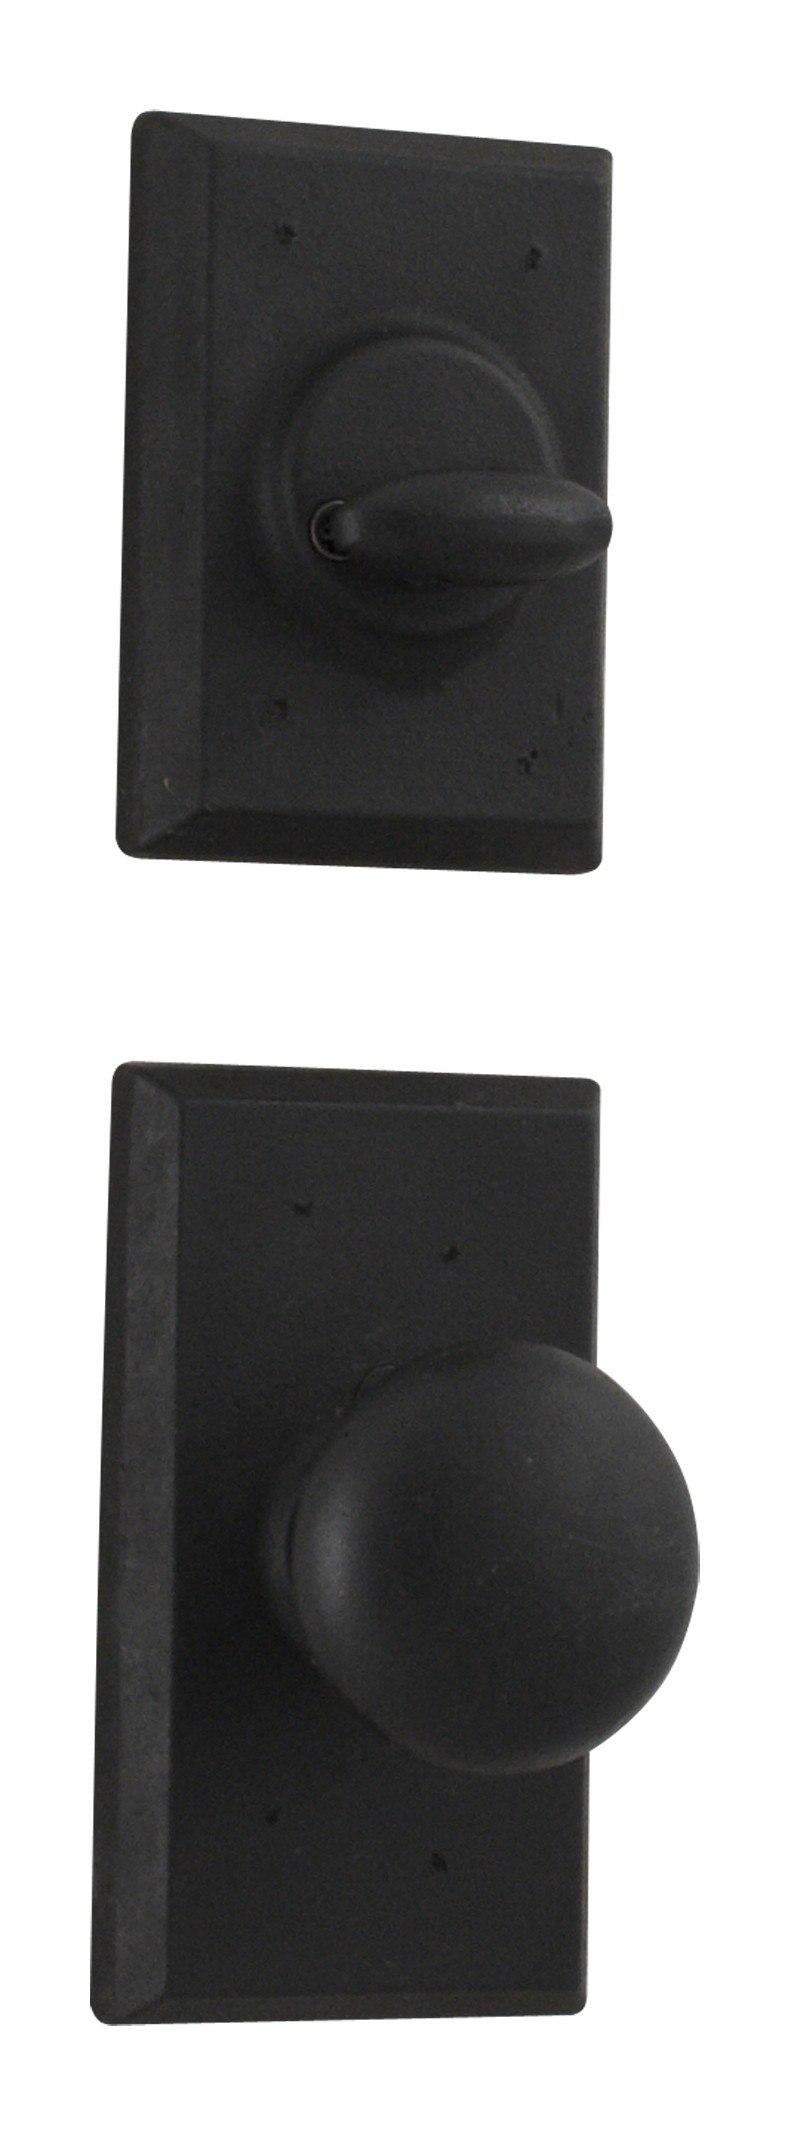 WESLOCK 07800--F MOLTEN BRONZE SINGLE CYLINDER INTERIOR PACK WITH WEXFORD KNOB